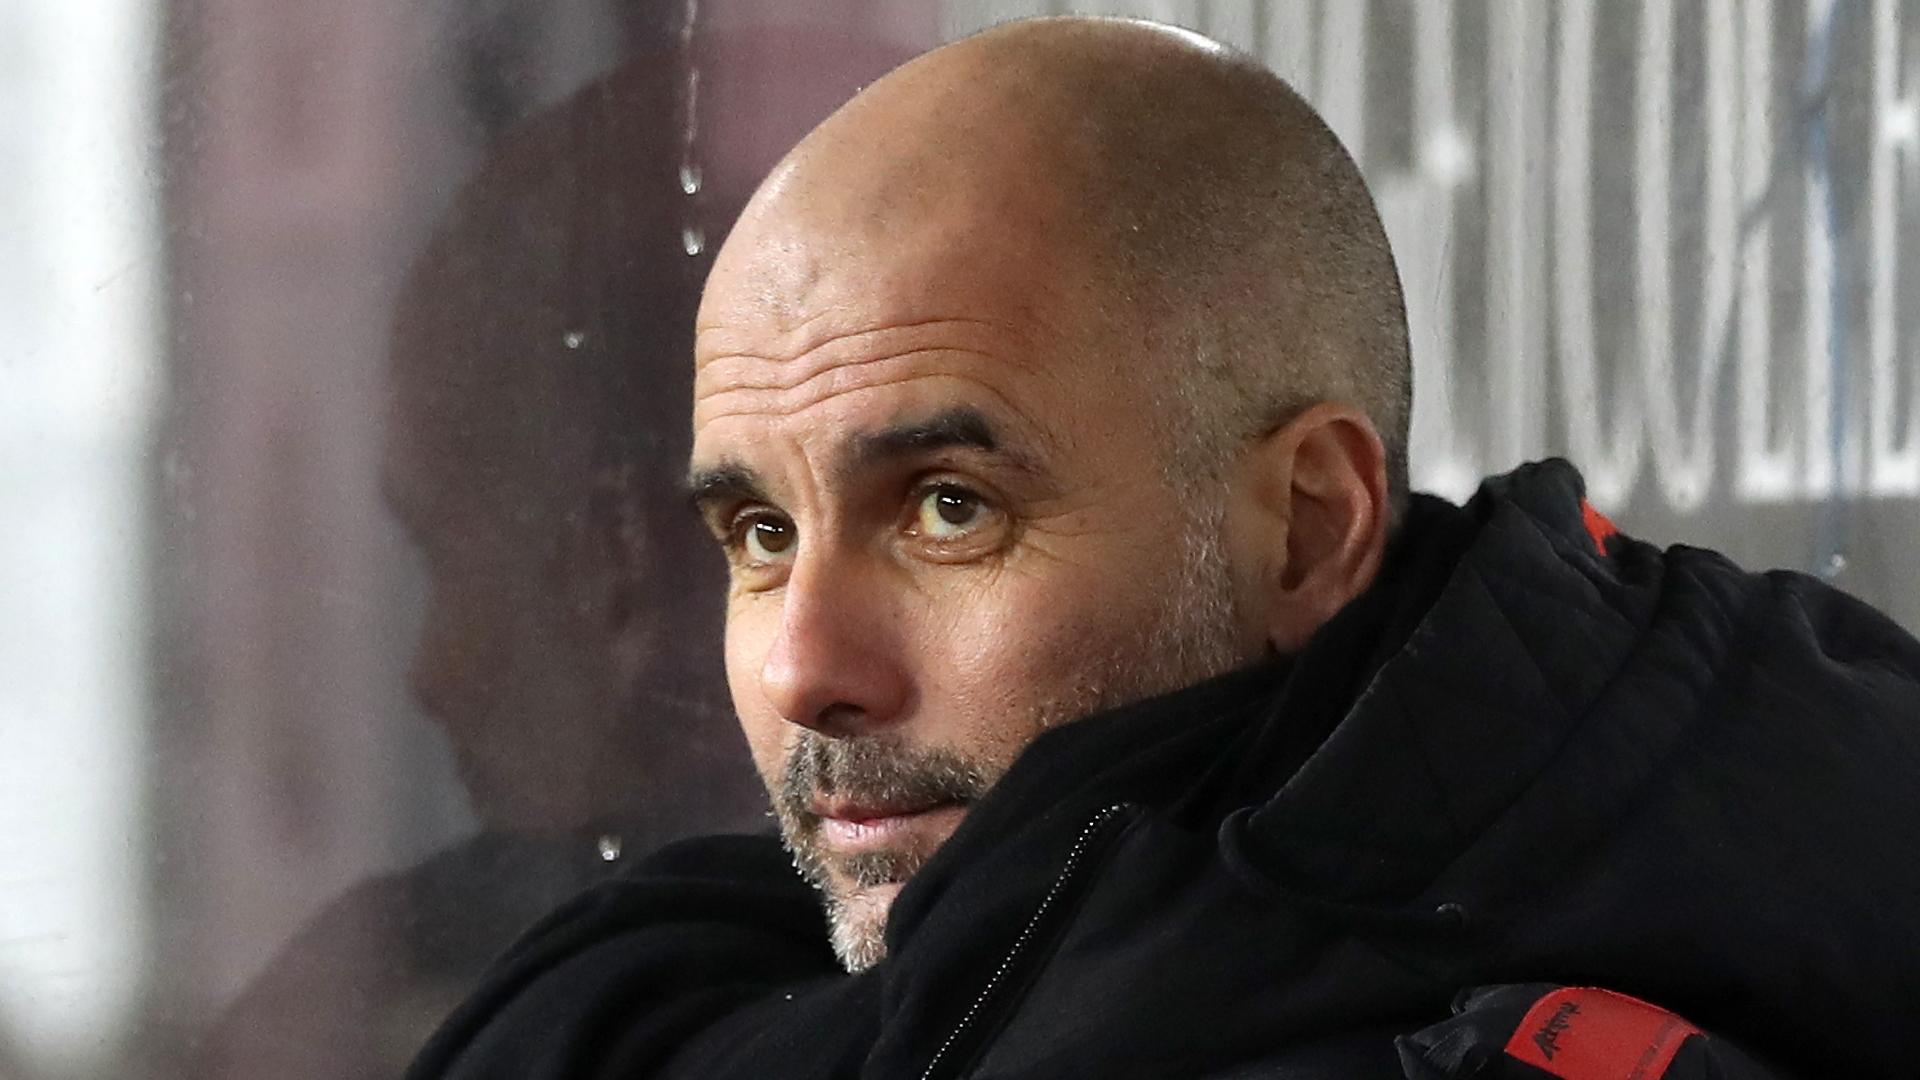 'We can do better' - Guardiola fires warning to rivals despite Man City's 20-game unbeaten run